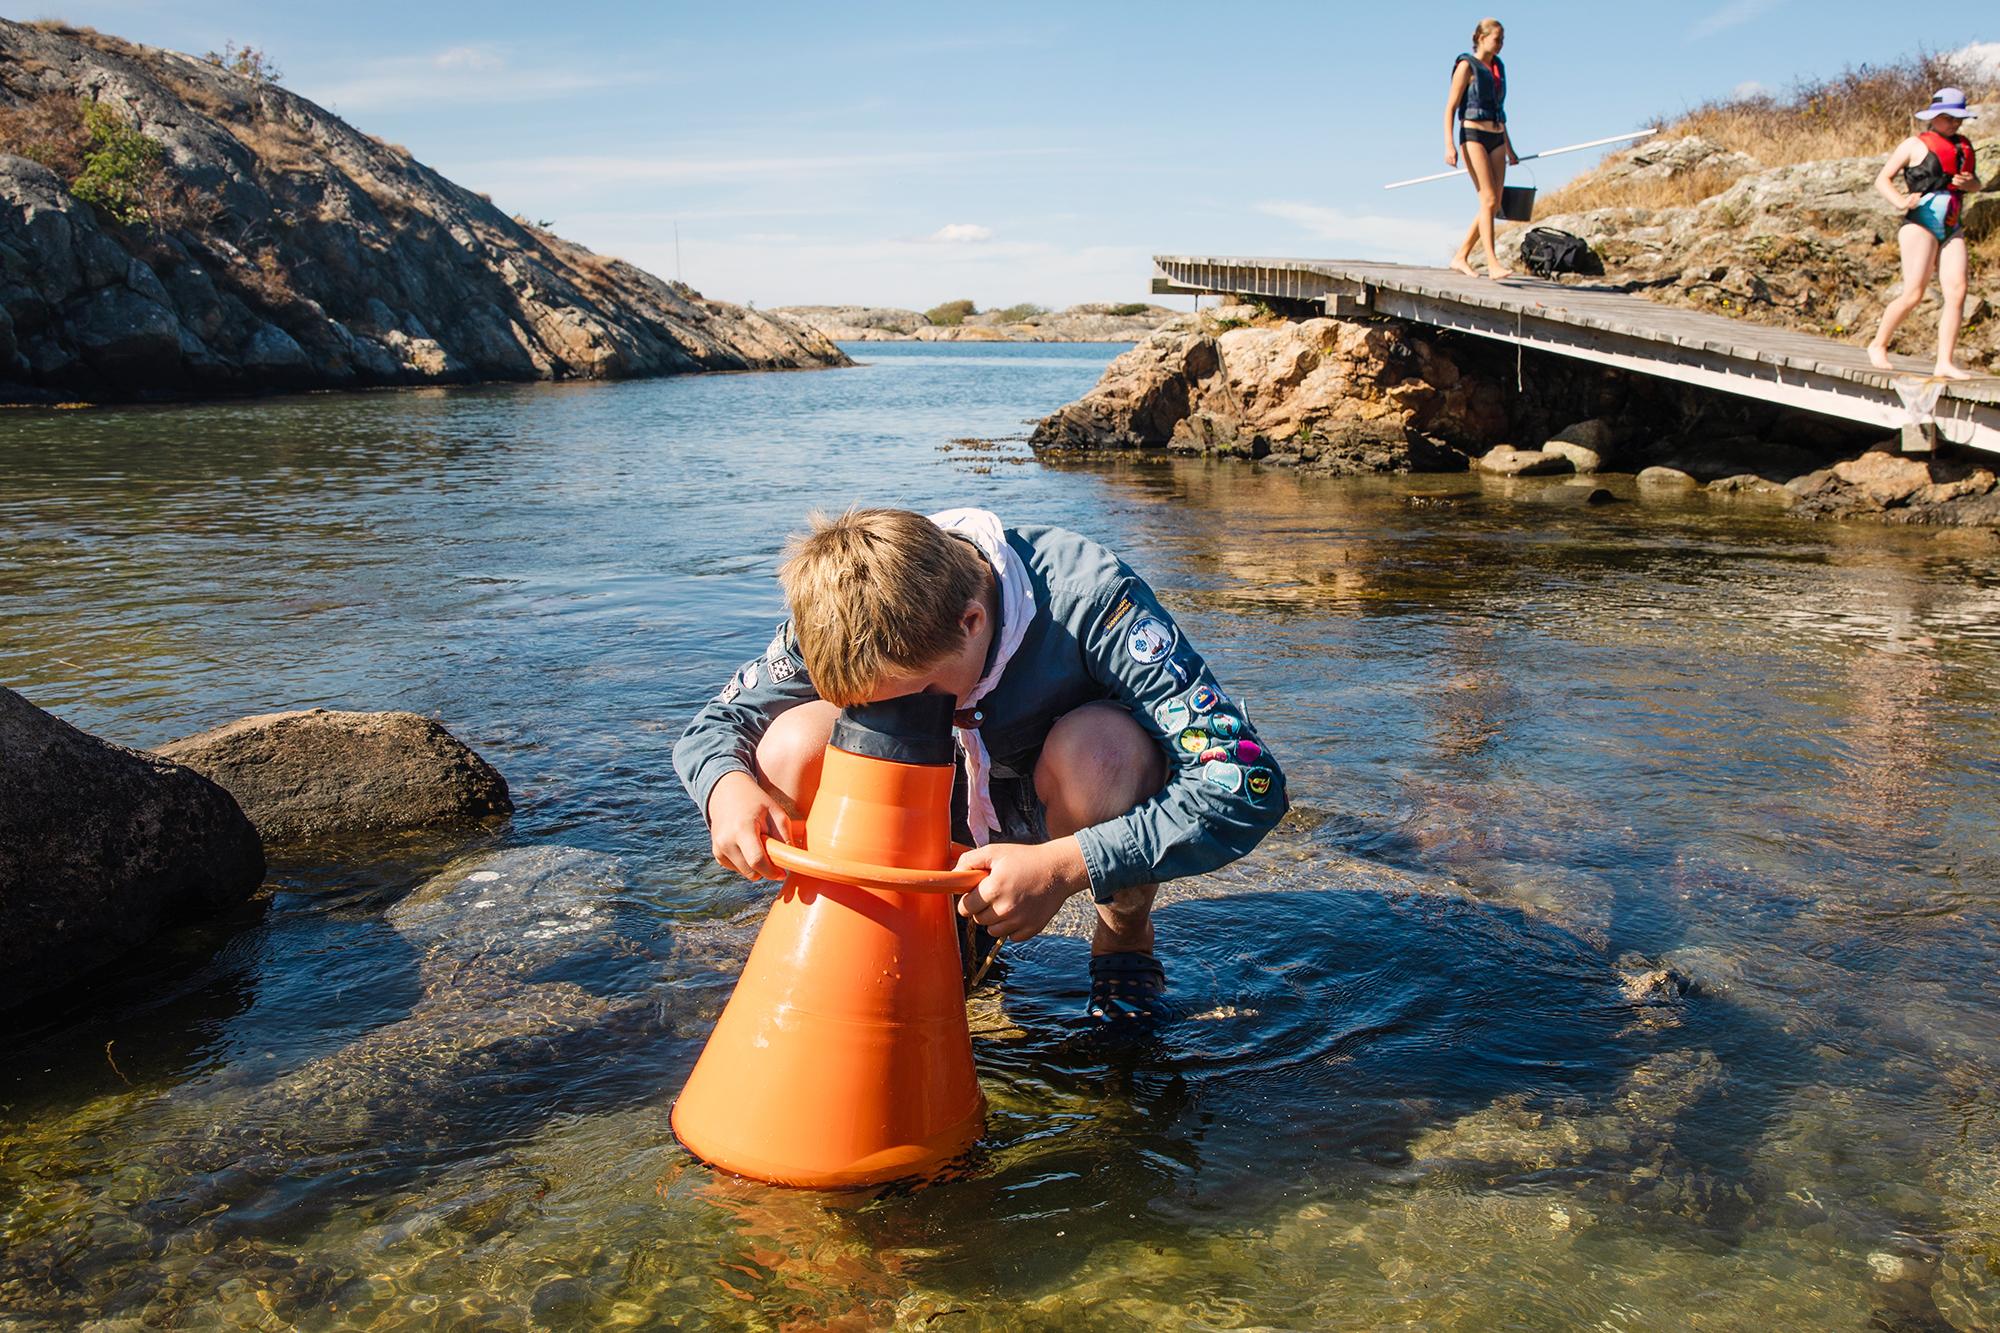 Scout undersöker vatten vid klippor;